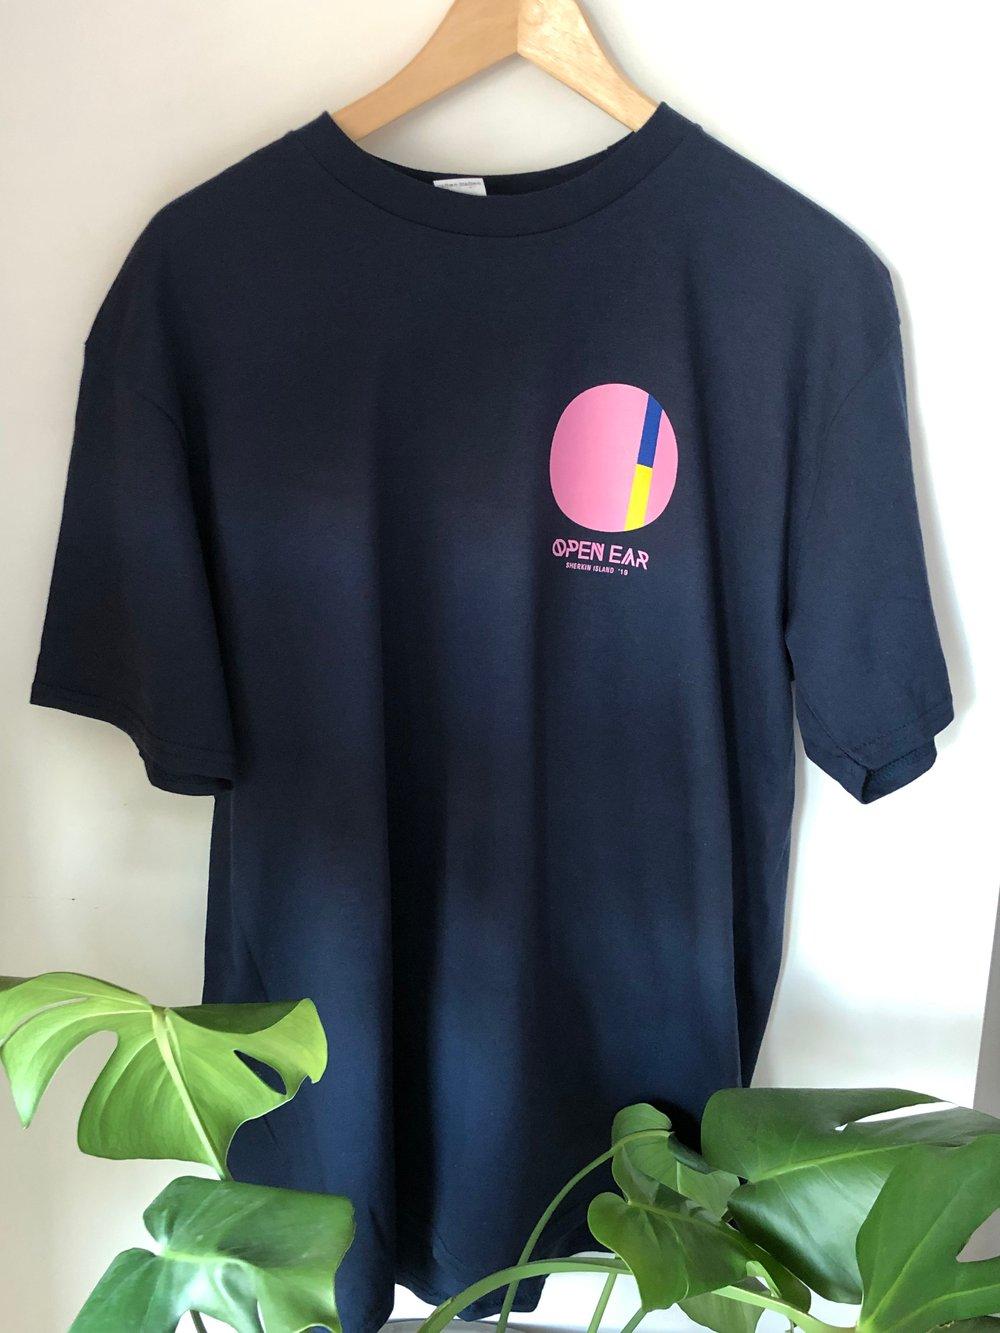 Image of Open Ear 2019 T-Shirt - Navy